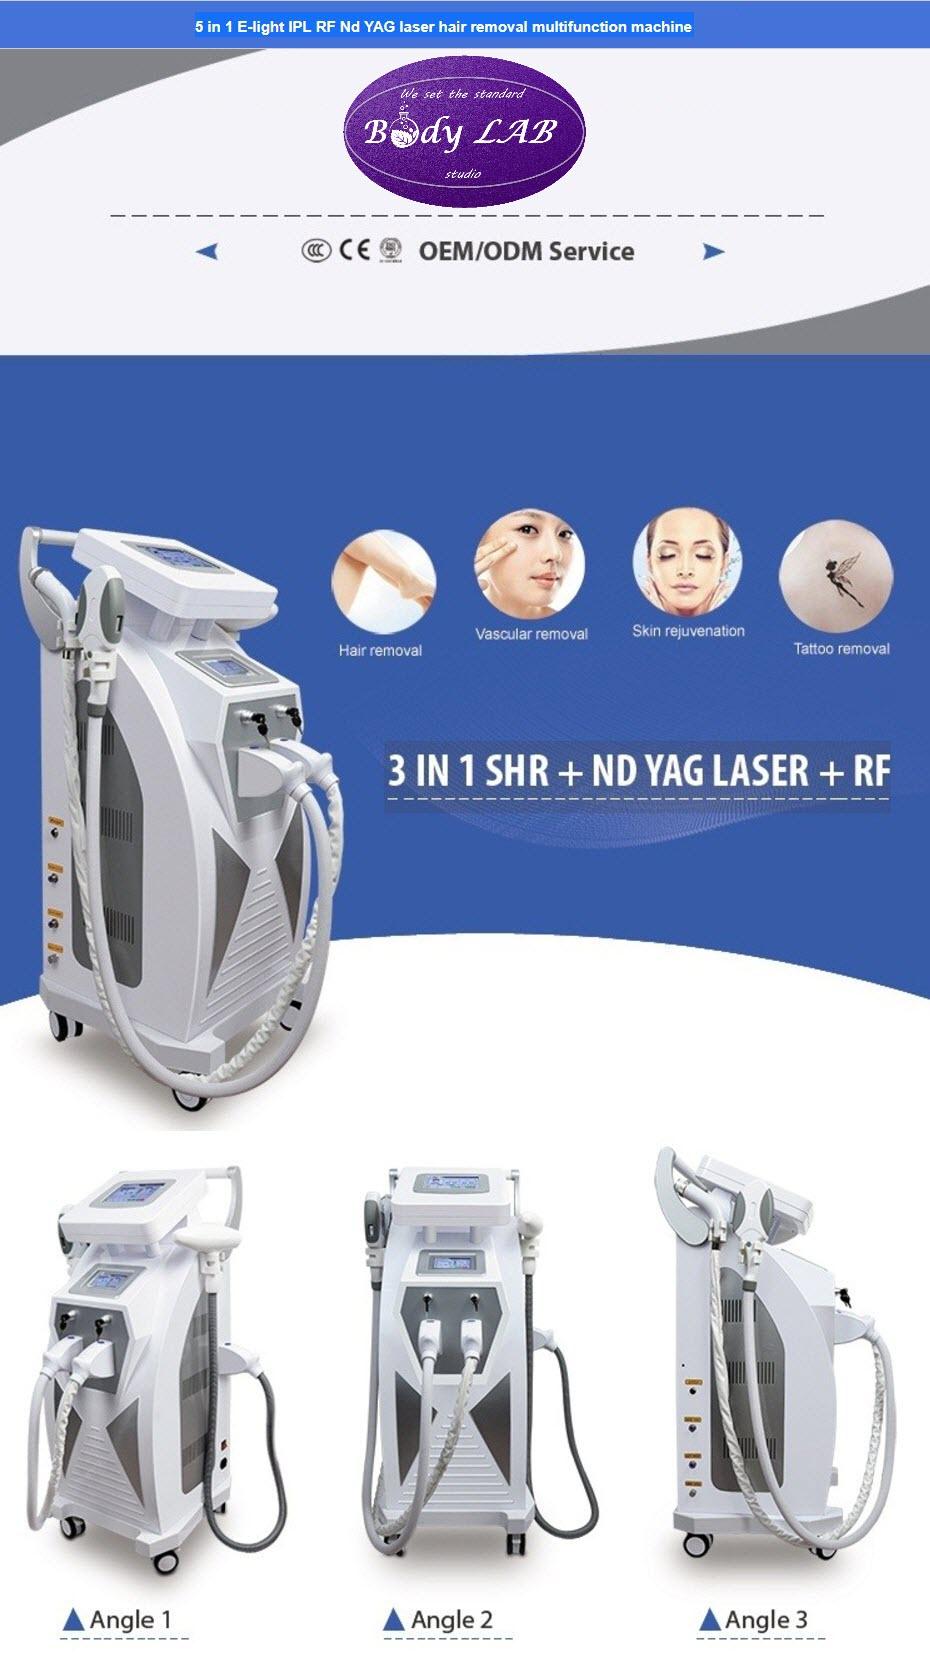 Мултифункционална E-light IPL RF Nd YAG лазер машина..